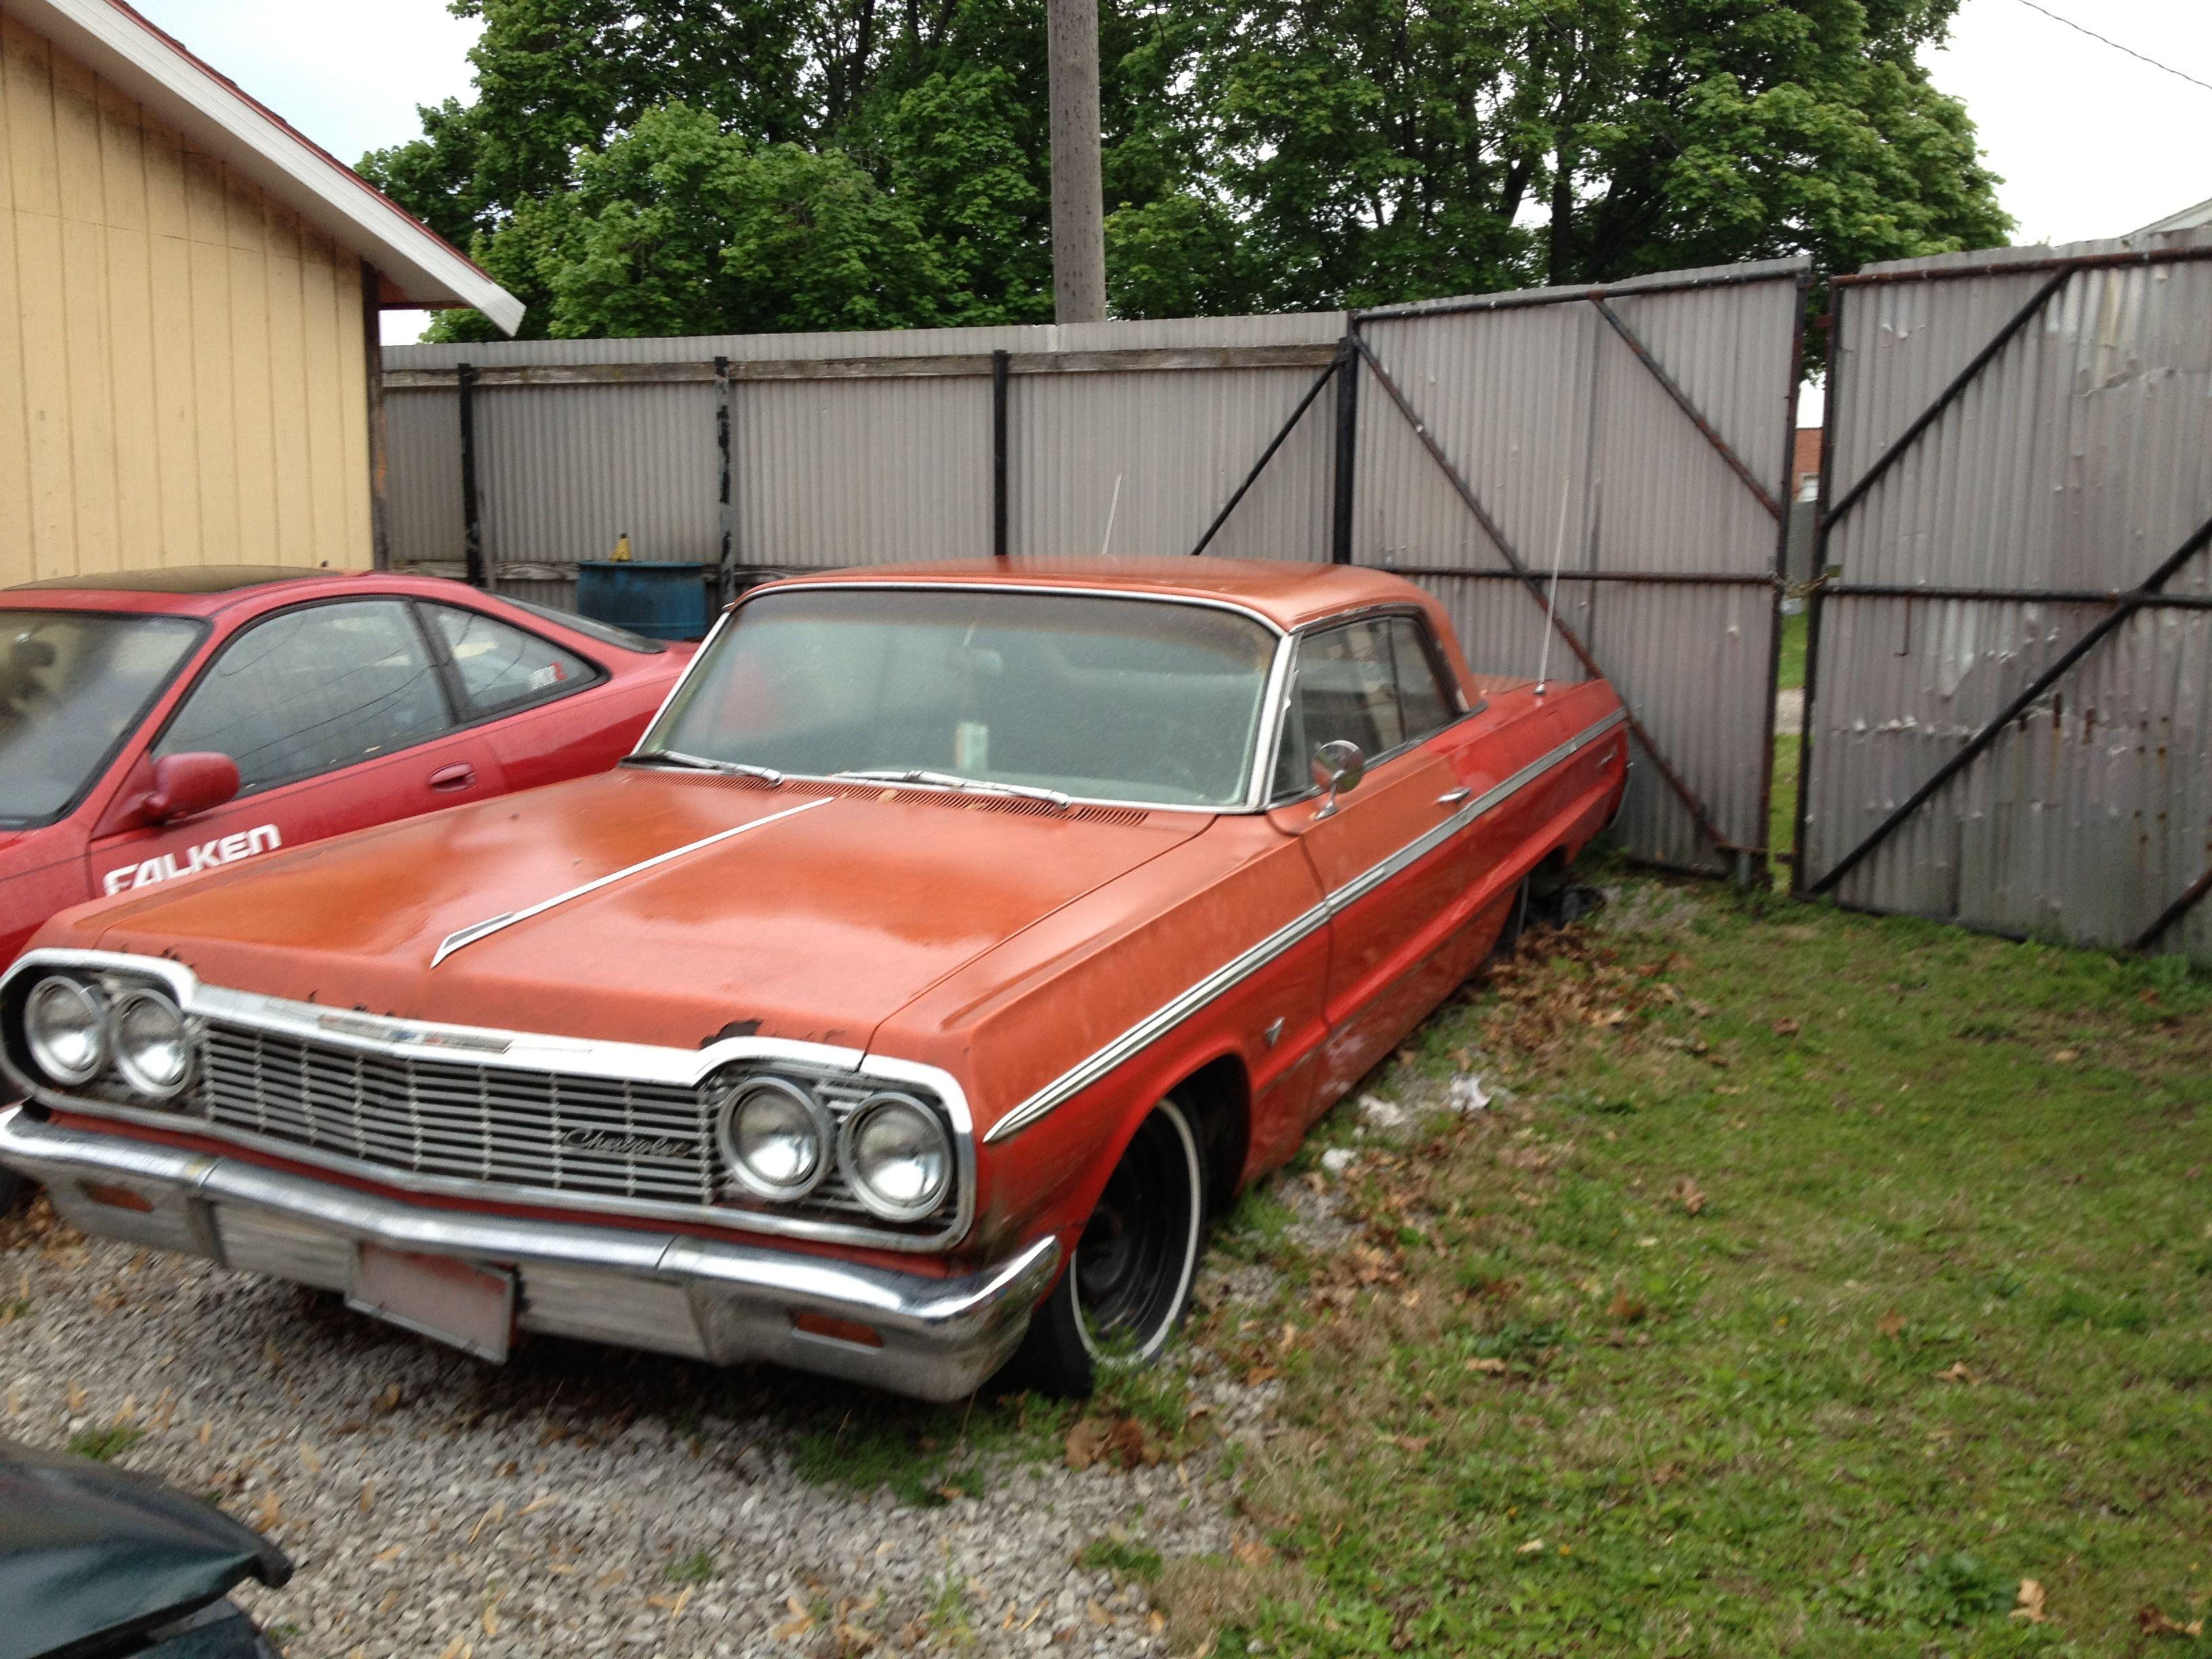 Pin On Impala Restoration Project